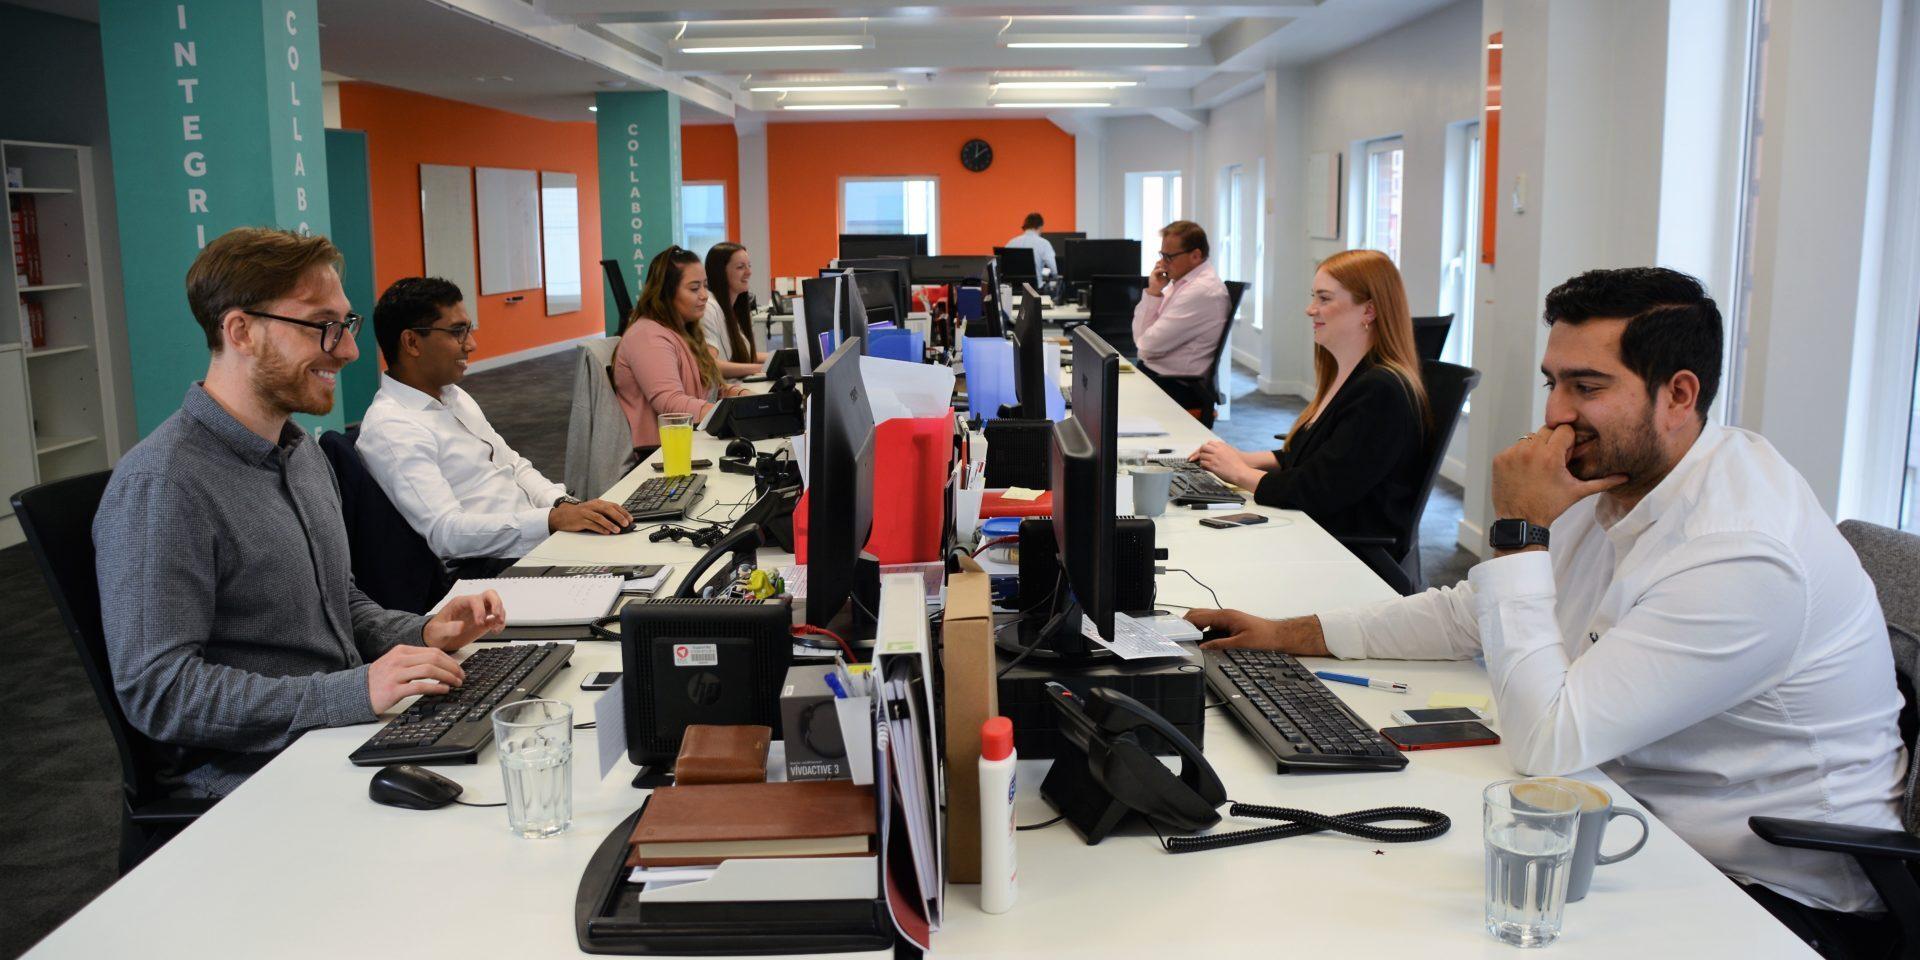 Mackenzie Jones Birmingham - FMCG Recruiters Office 2